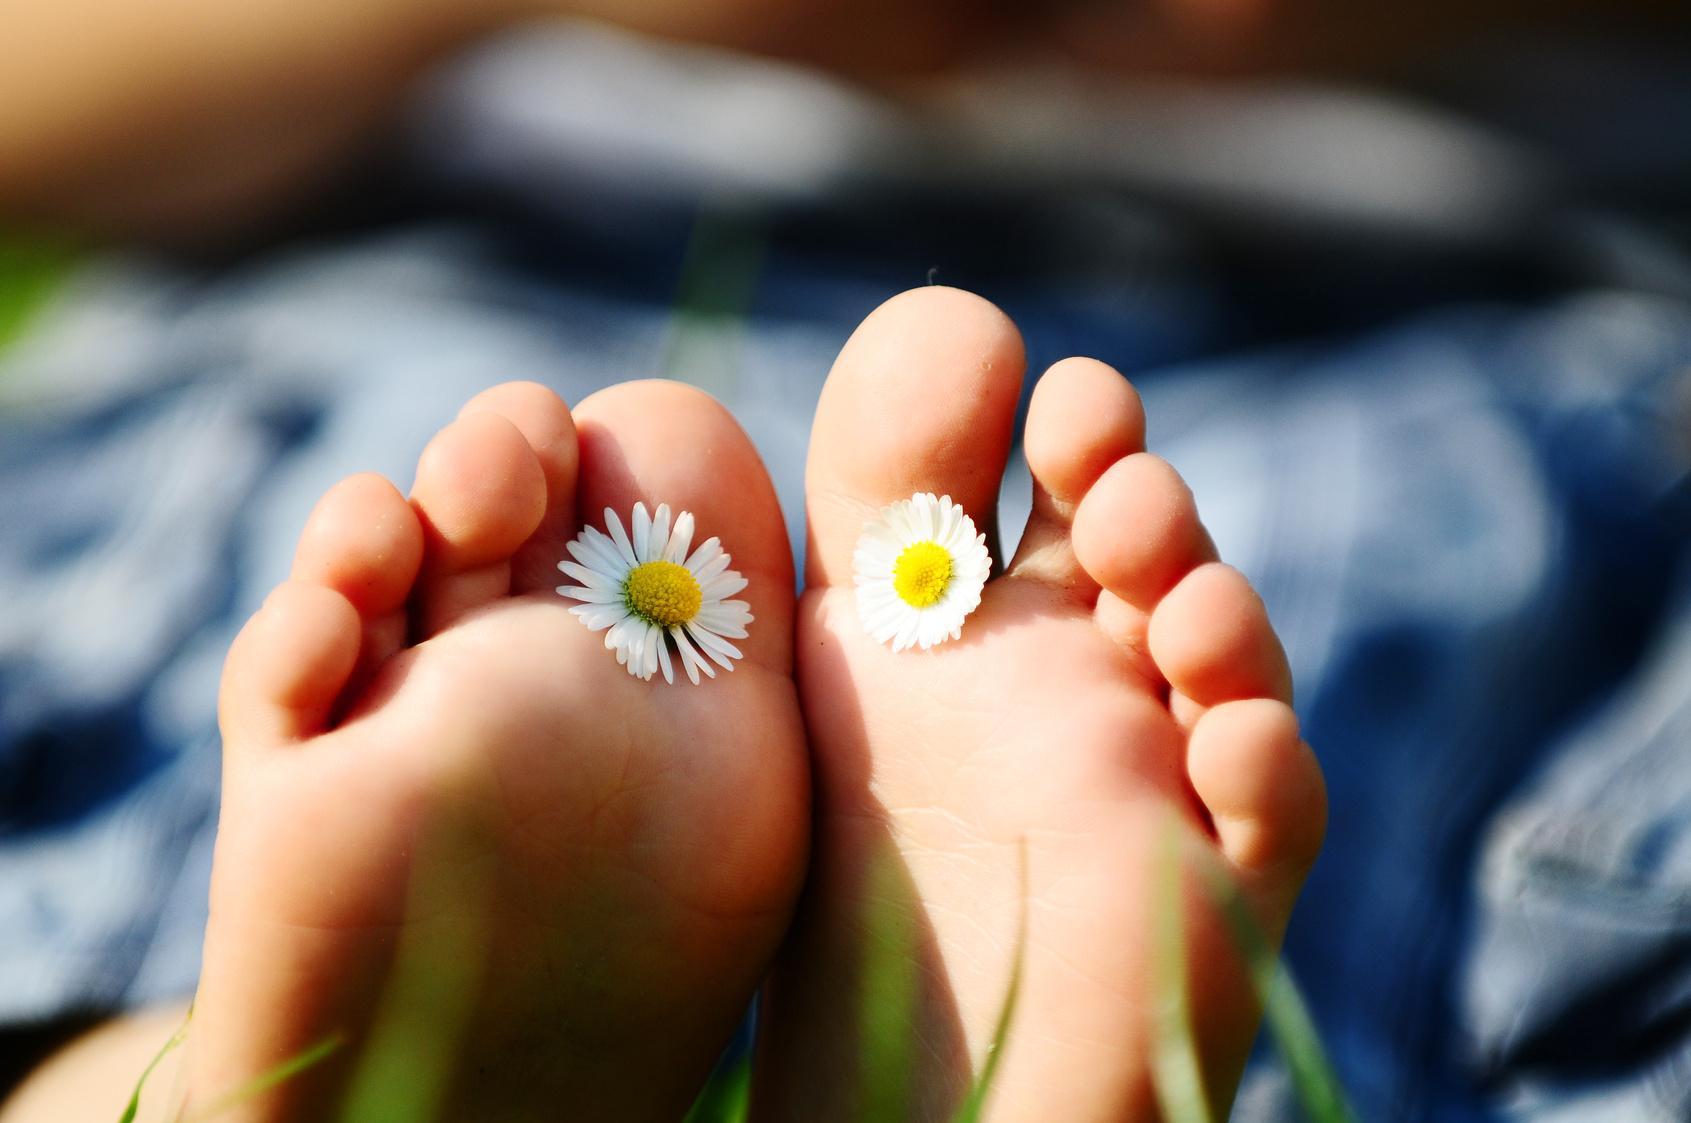 Flower power feet